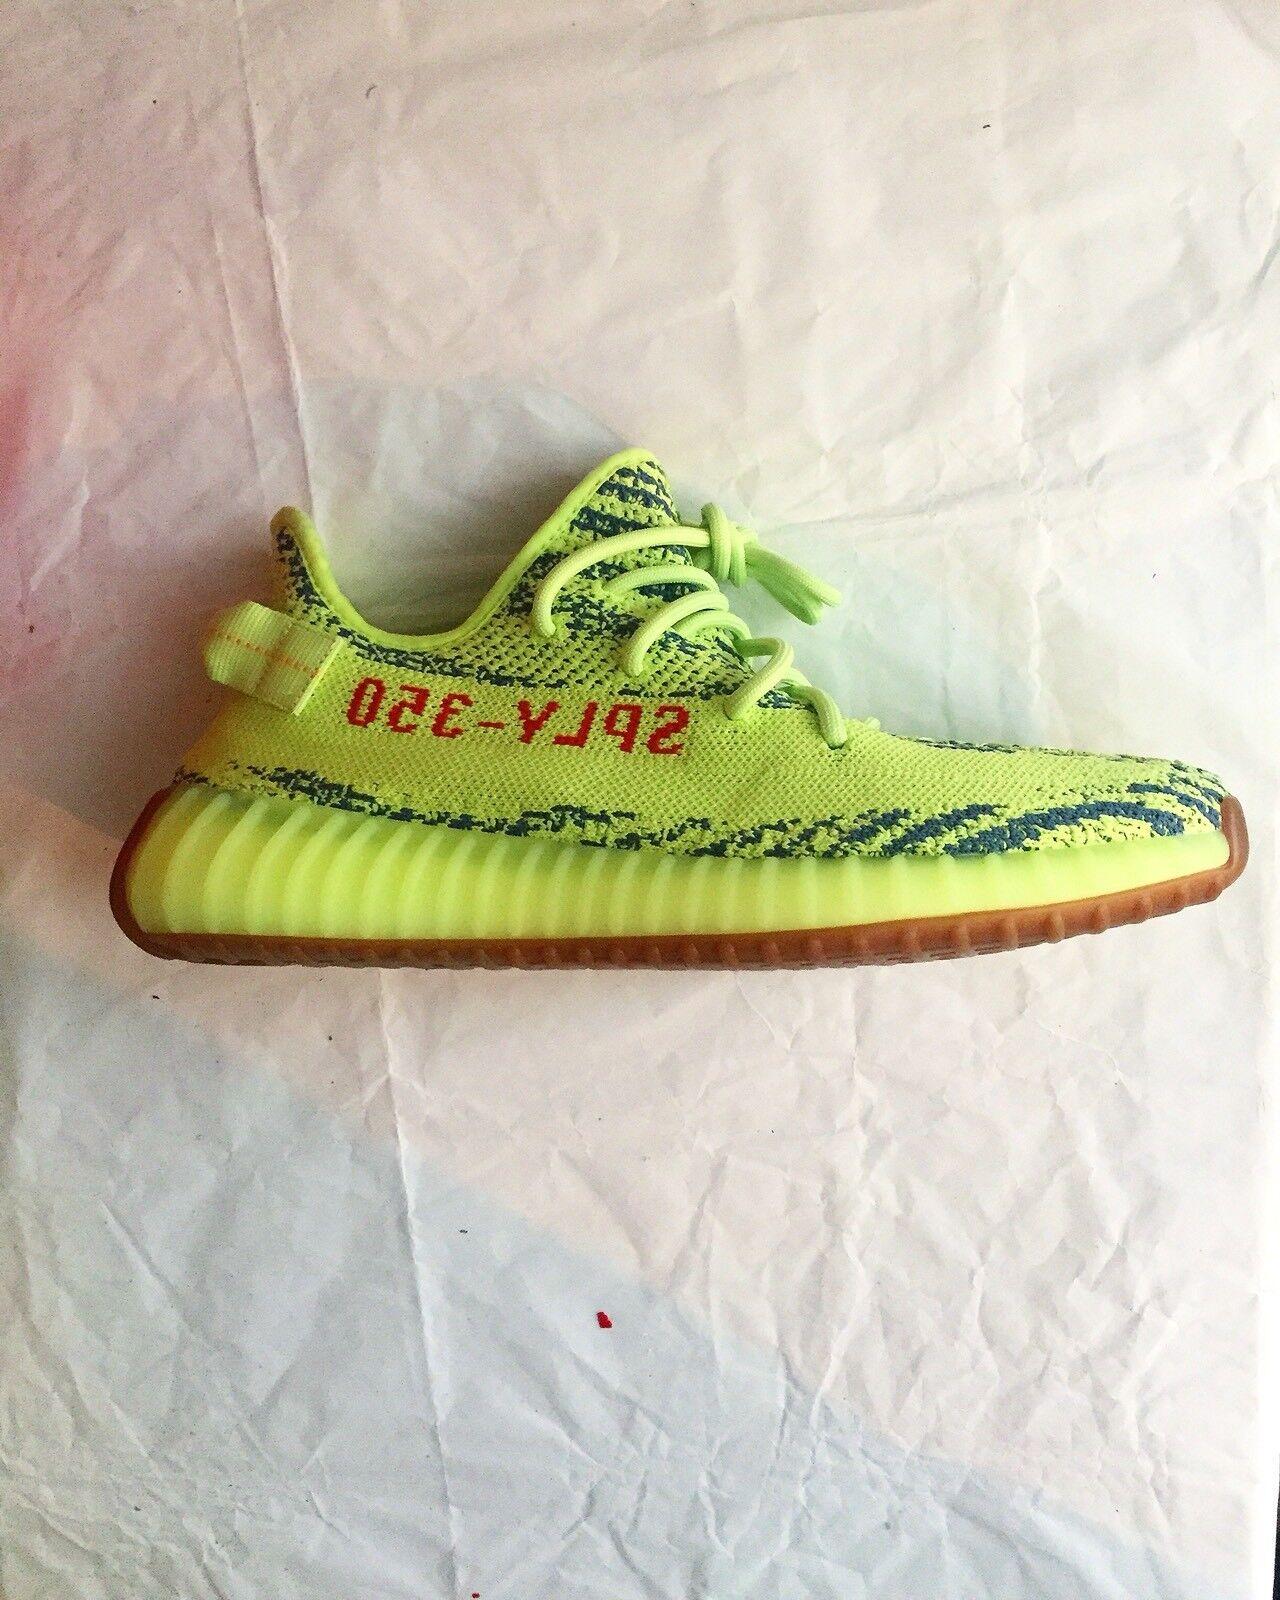 Adidas Yeezy Boost 350 v2 Semi Frozen Yellow Yebra size 8.5 Kanye West